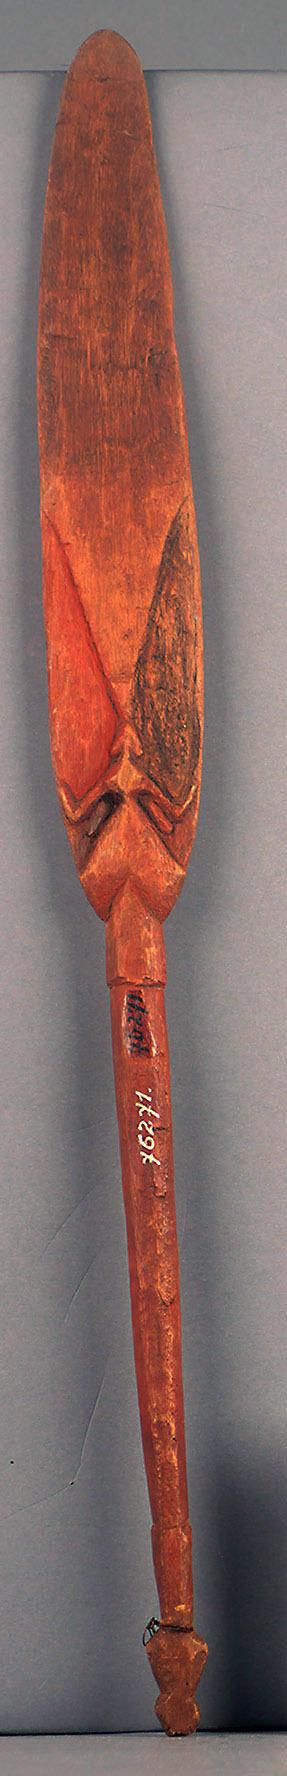 Holzspatel mit Libellenmotiv